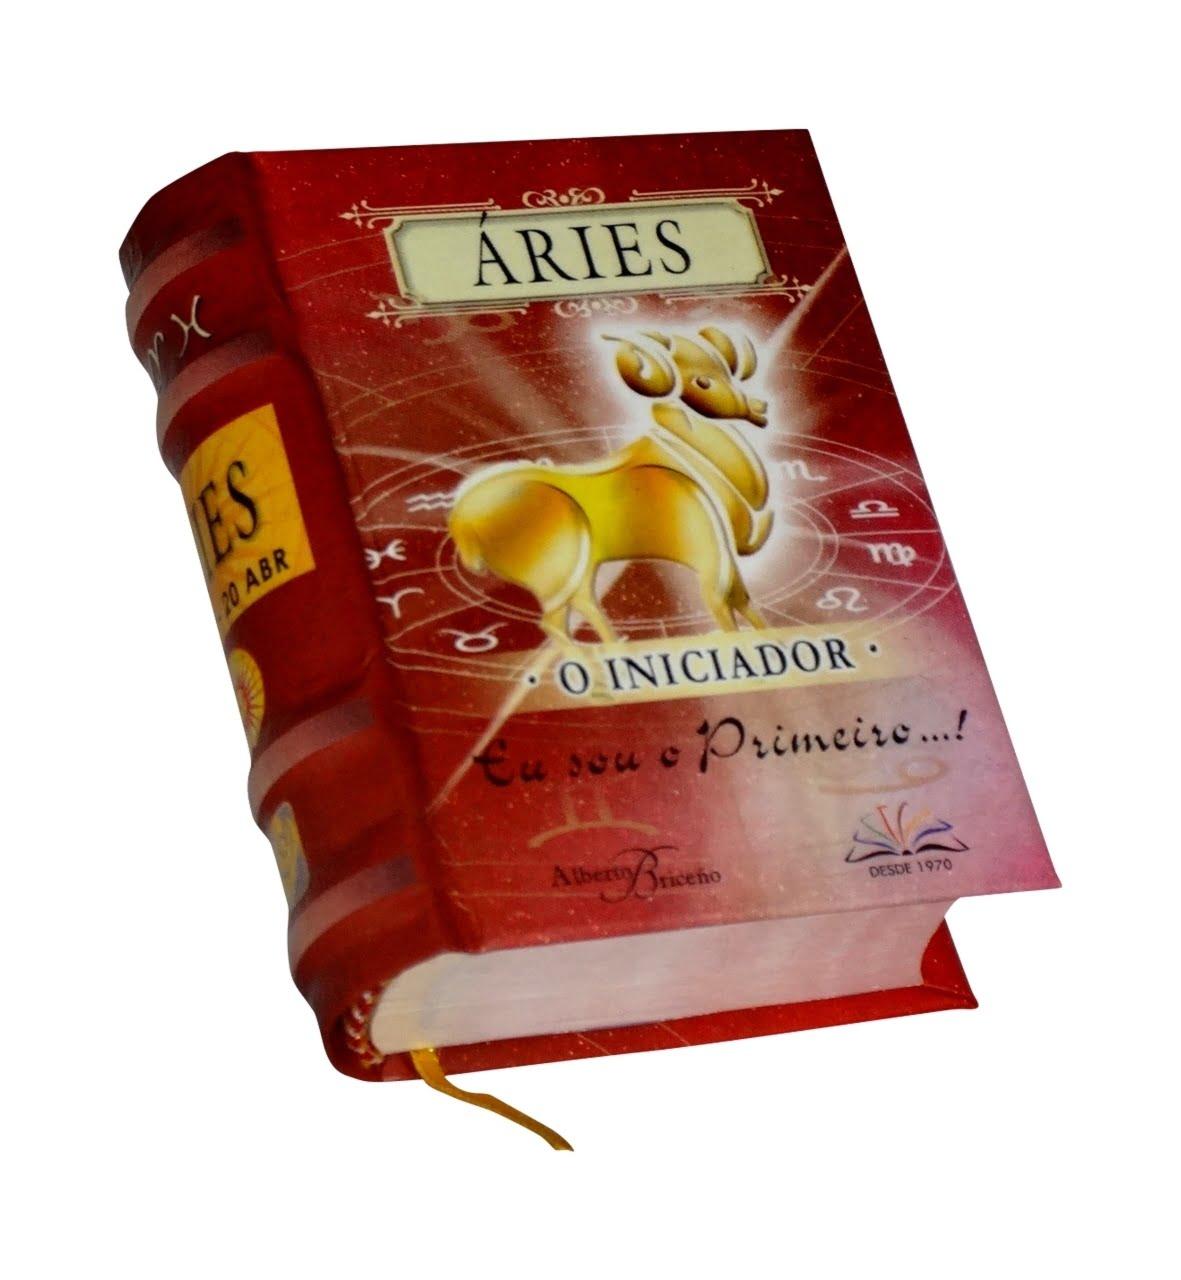 aries_portugues-miniature-book-libro